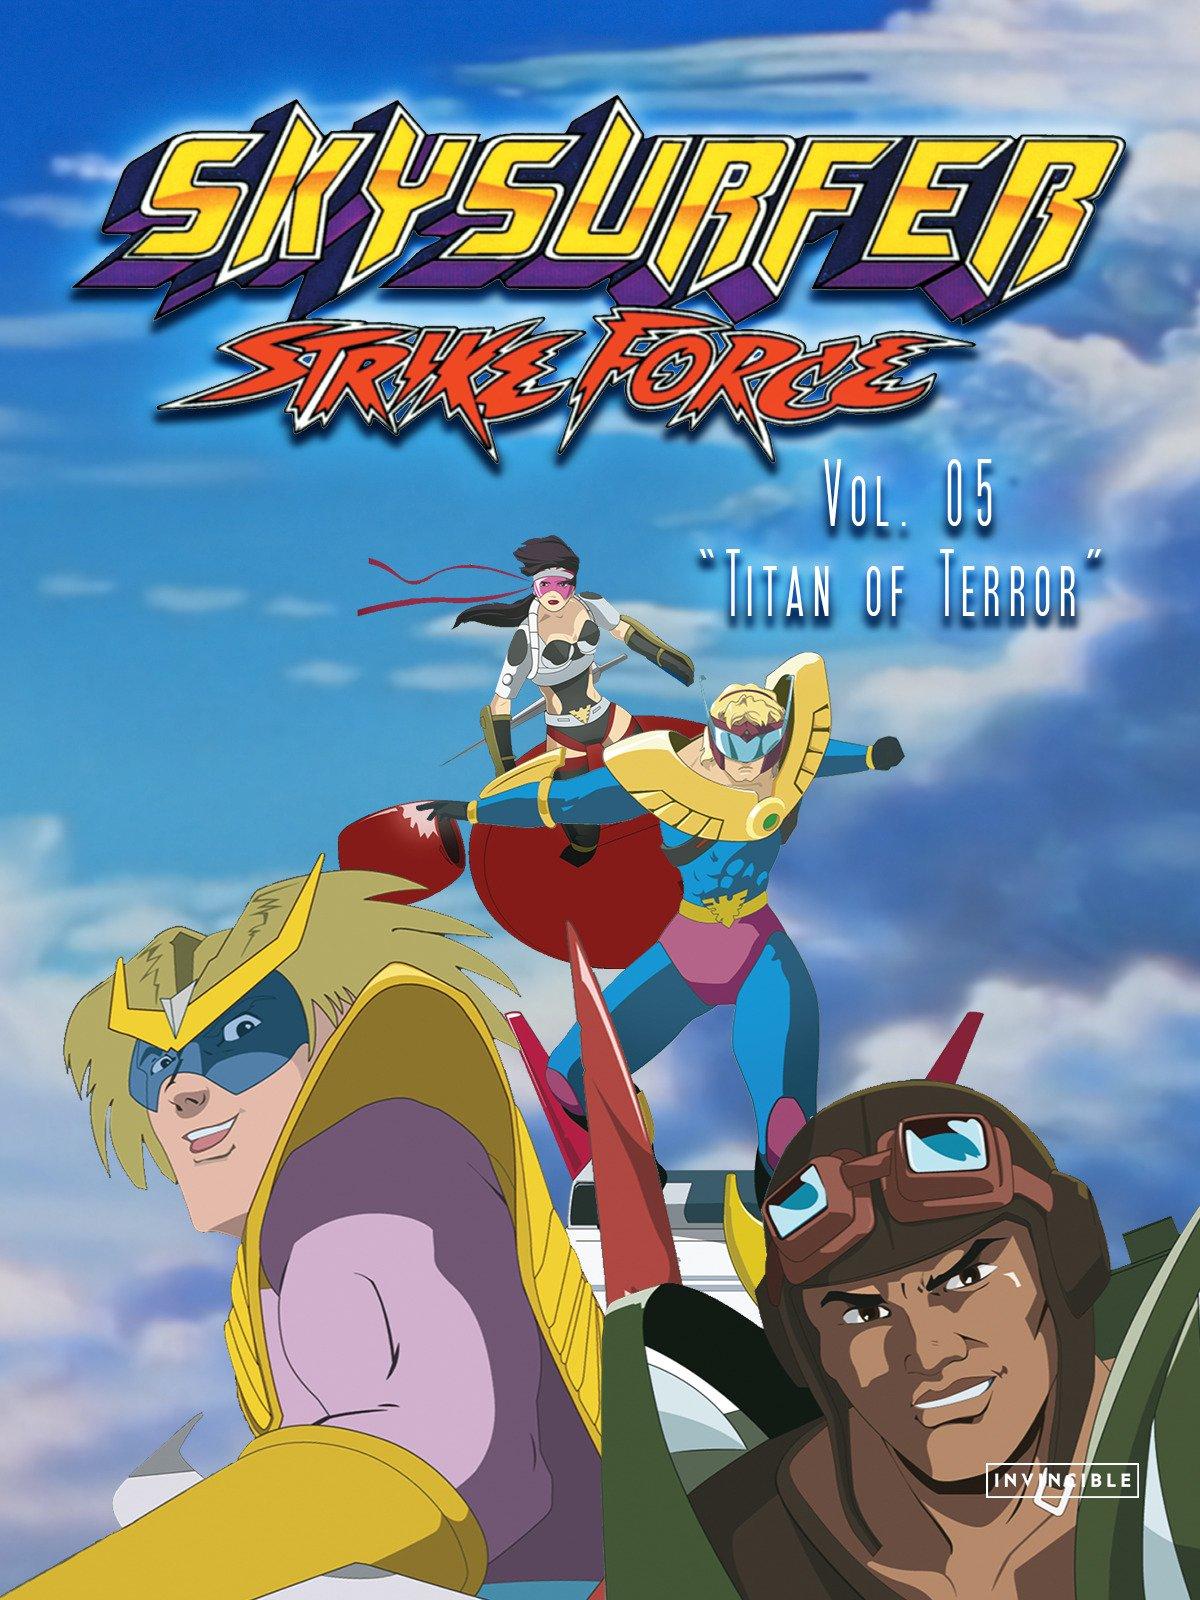 Skysurfer Strike Force Vol. 05Titan of Terror